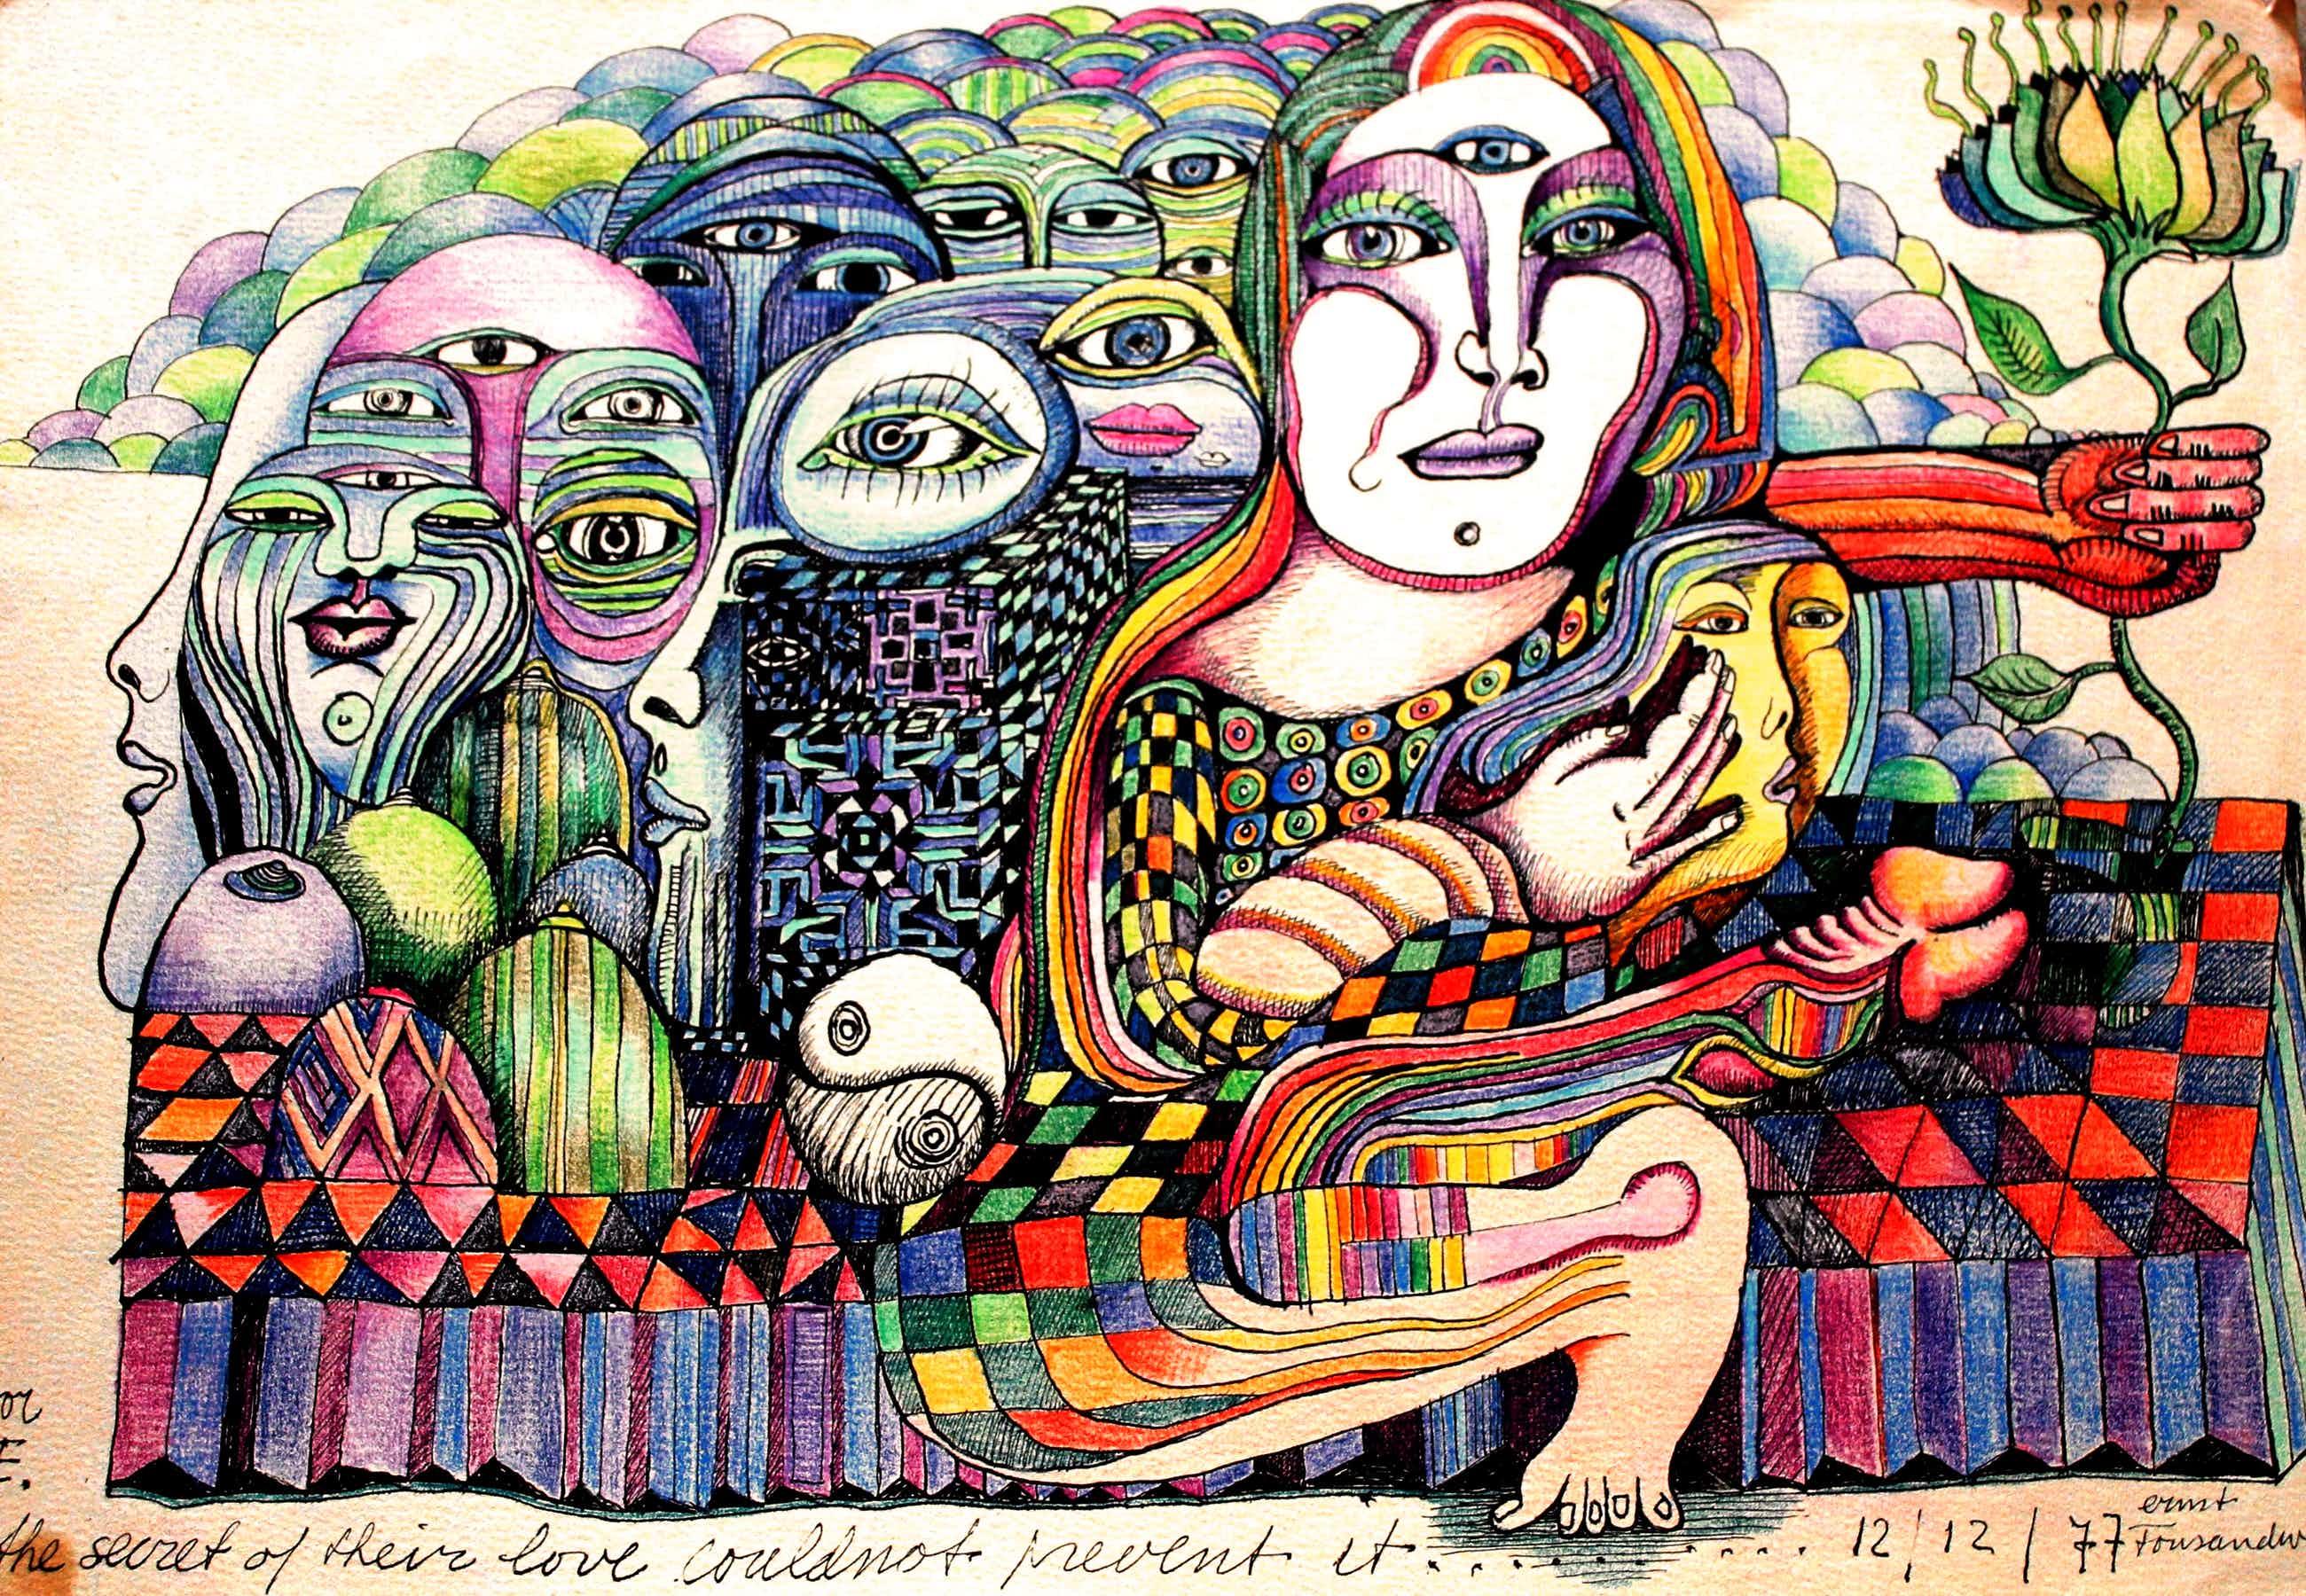 Ernst Vijlbrief - tekening: The secret of their love could not prevent it - 1977 kopen? Bied vanaf 60!